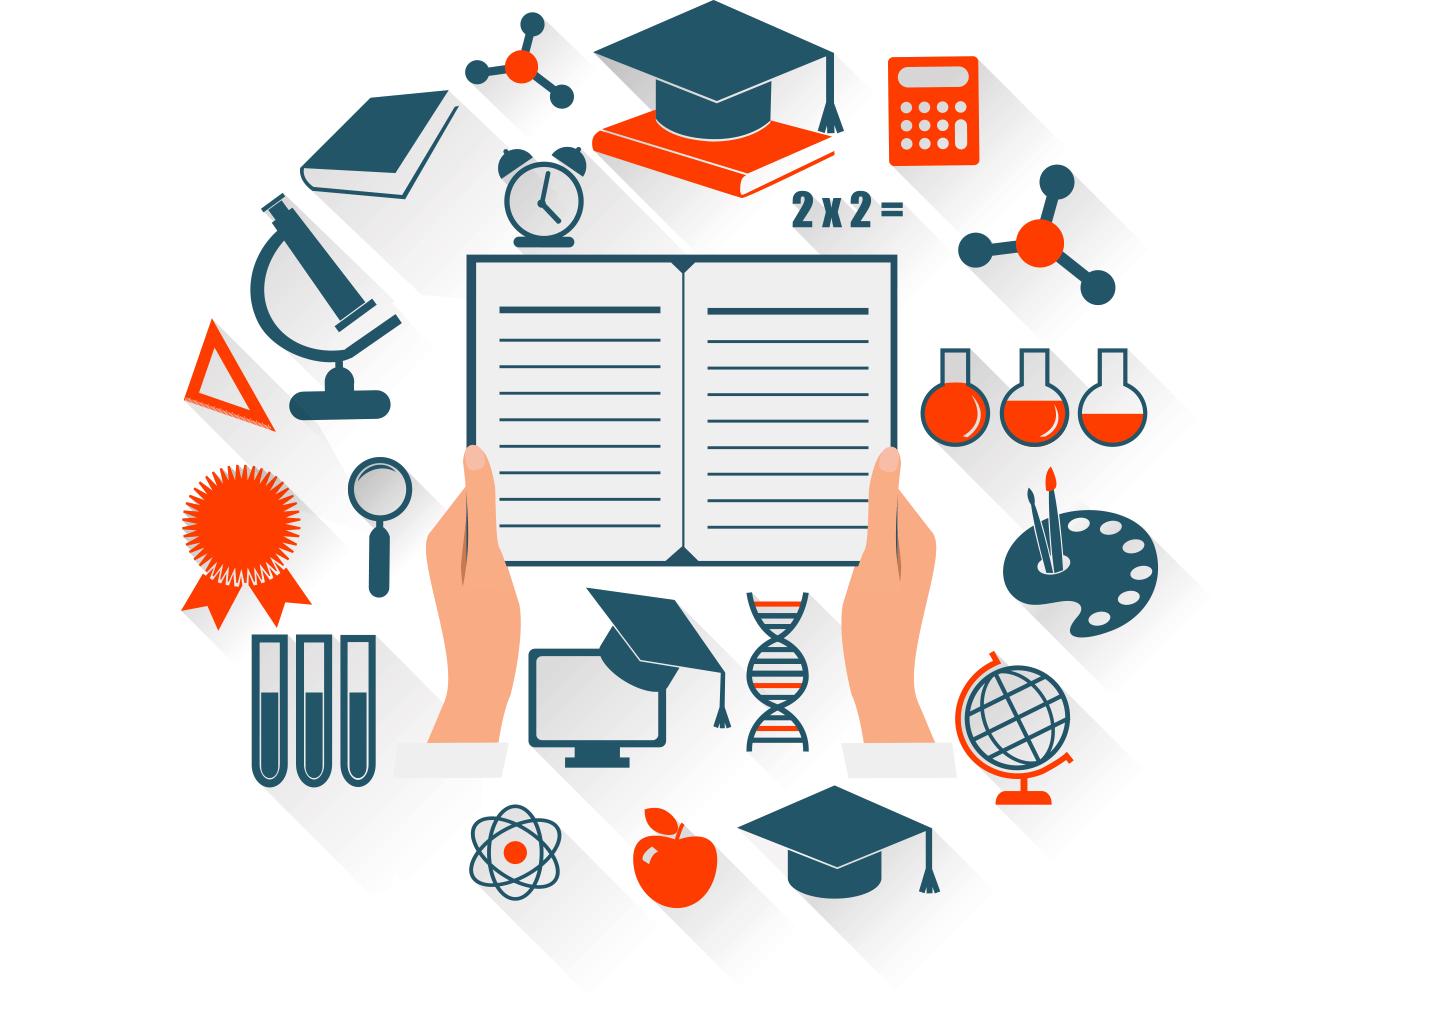 E learning educational reading. Technology clipart technology education